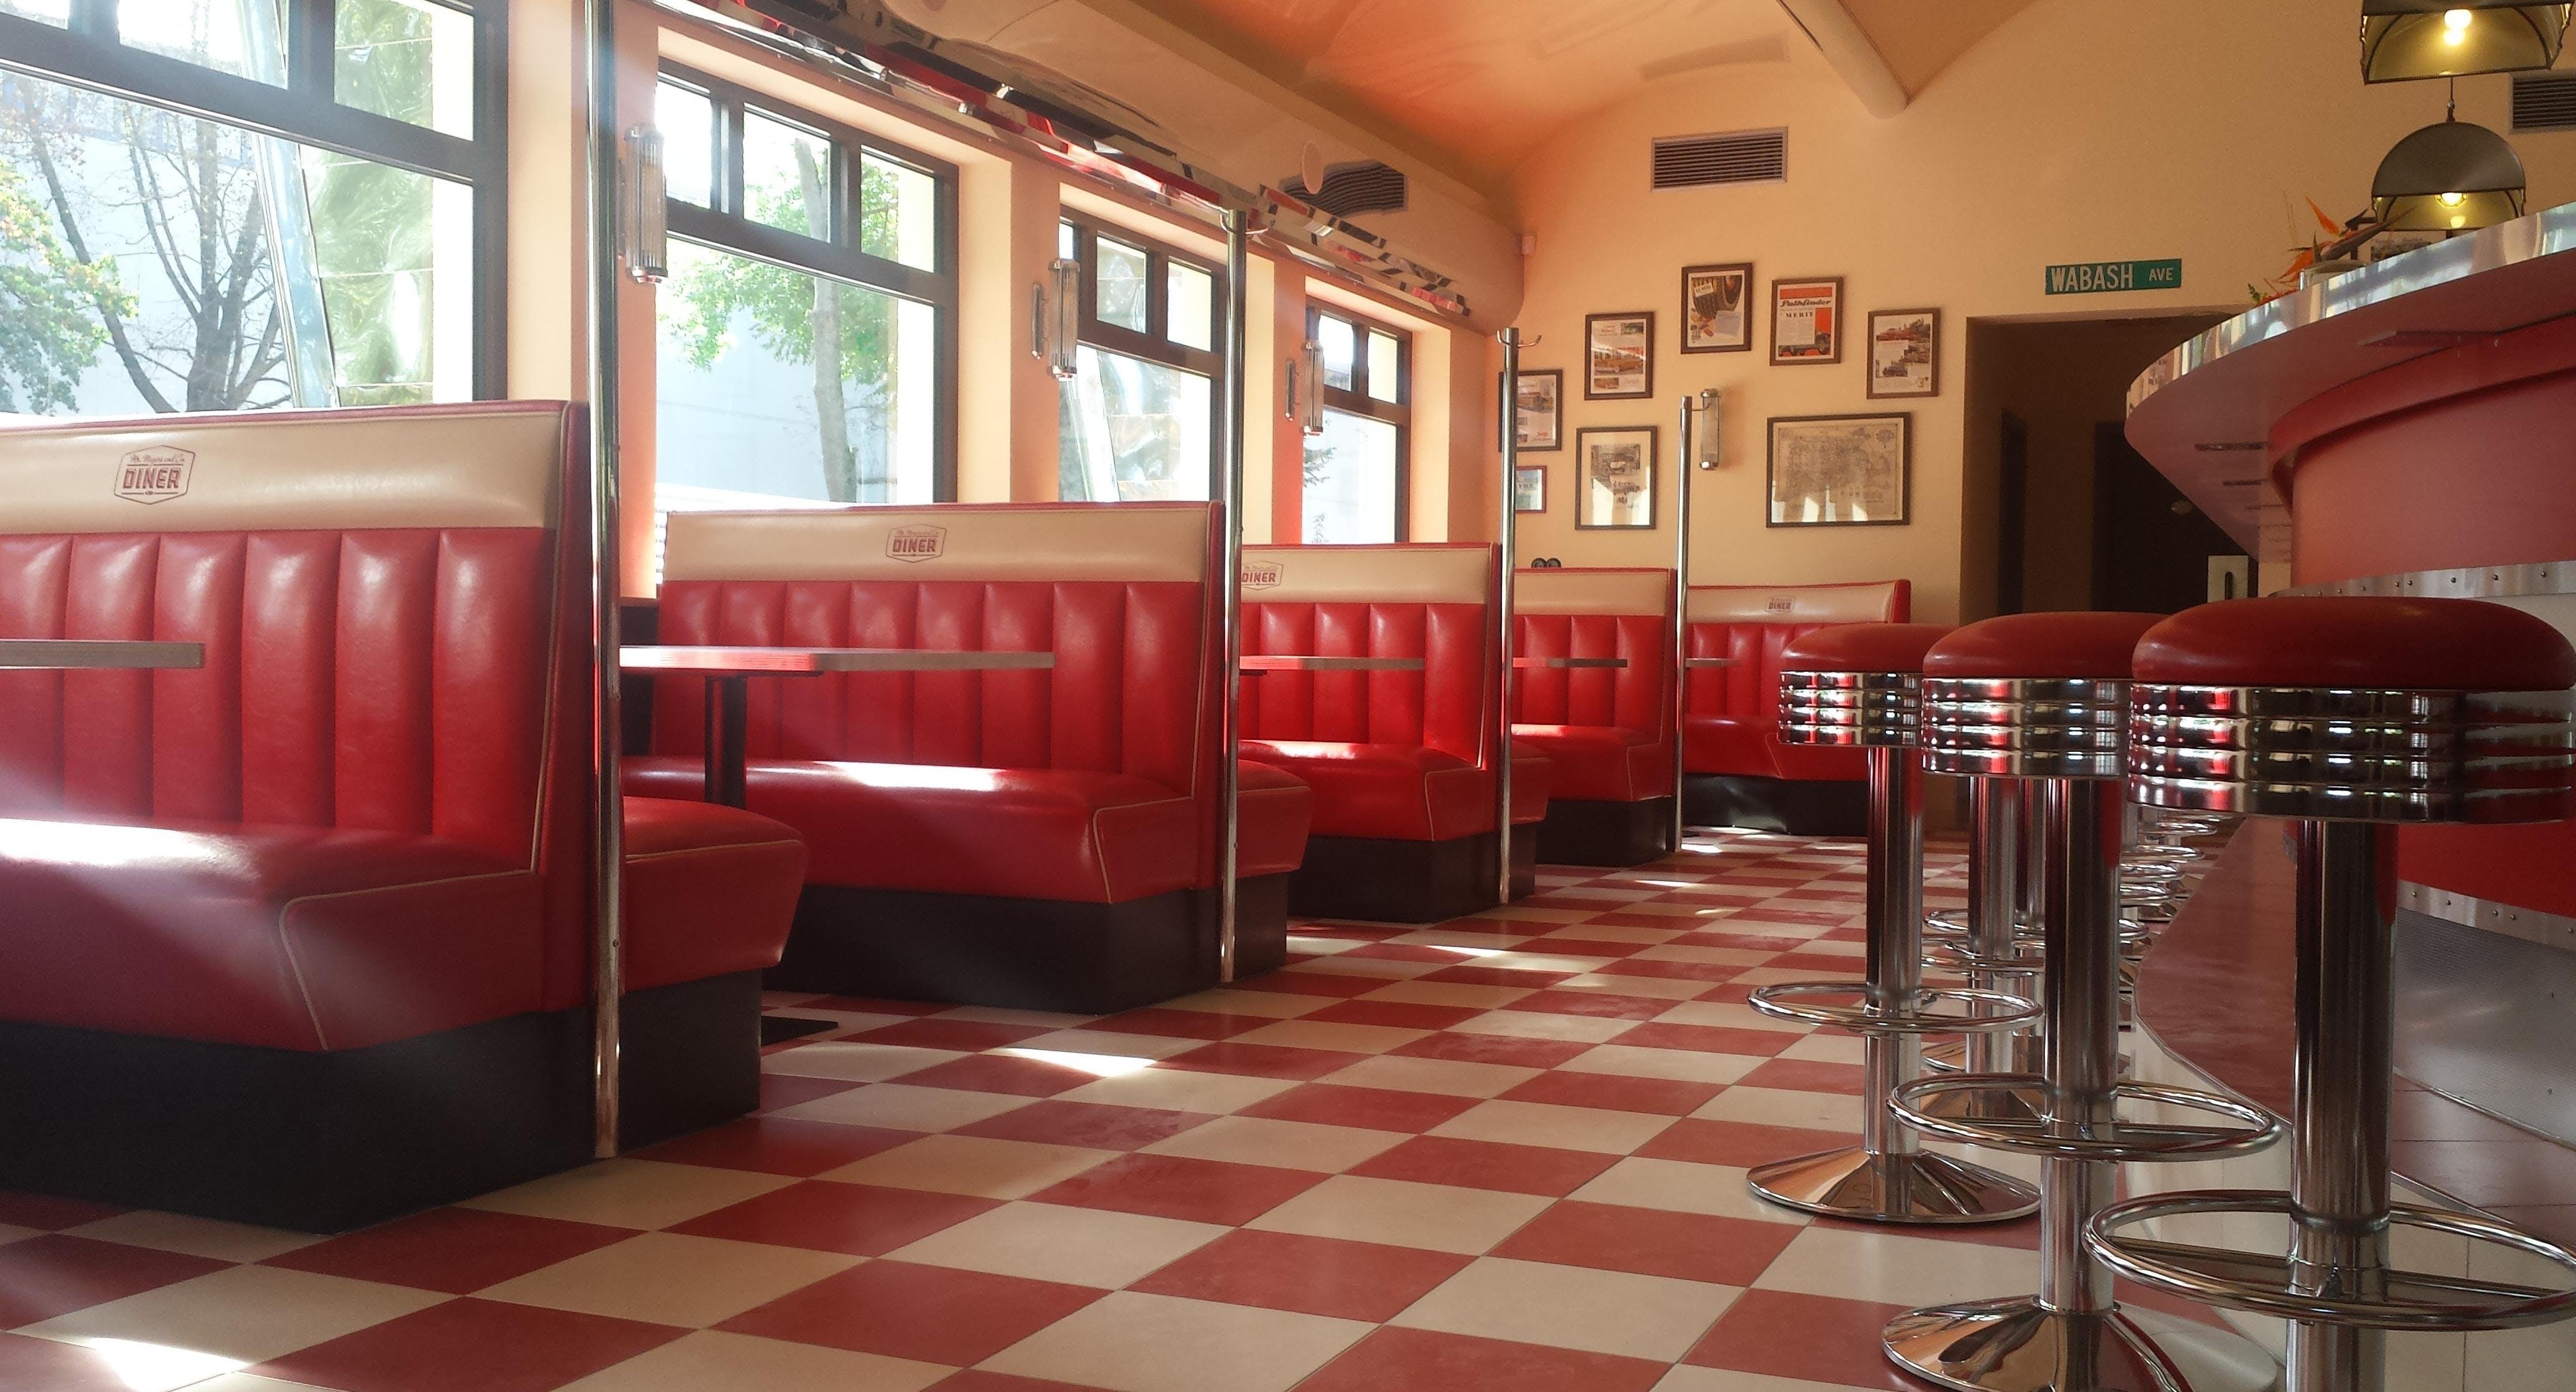 Mr. Meyers Diner Chemnitz image 2